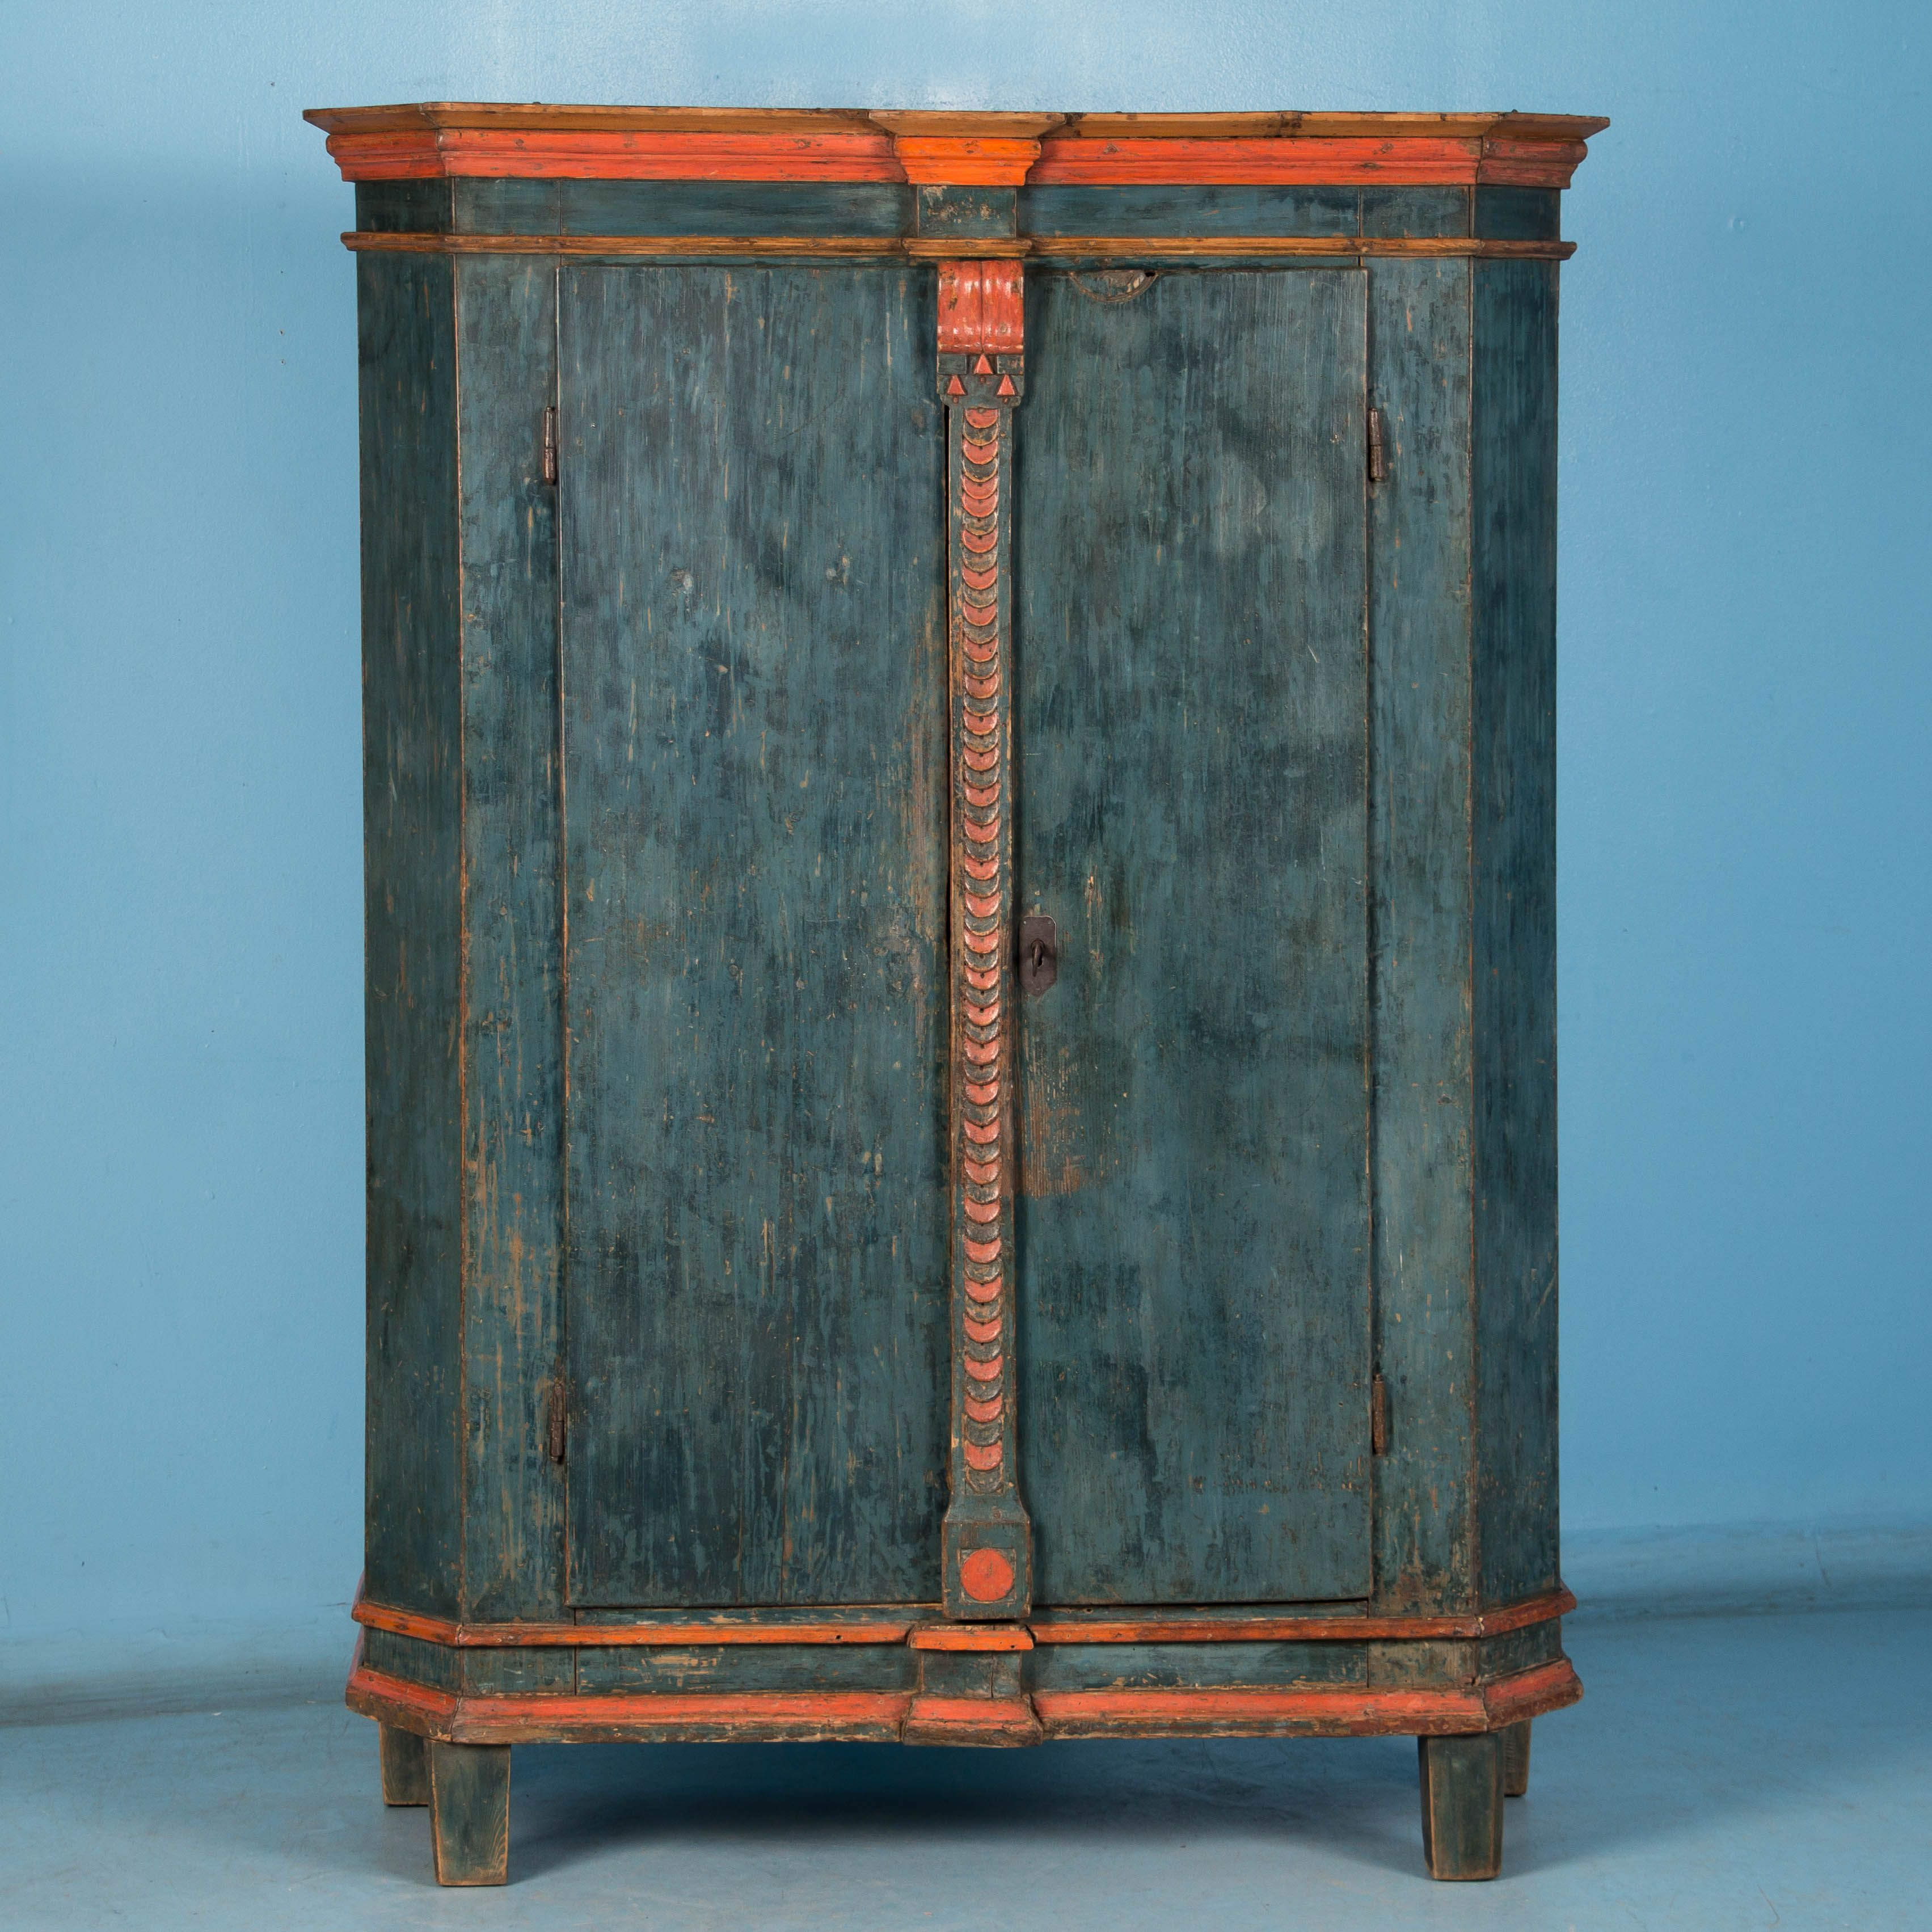 Armoires Wardrobes Scandinavian Antiques Antique Furniture For Sale Armoire Antique Furniture For Sale Bedroom Armoire